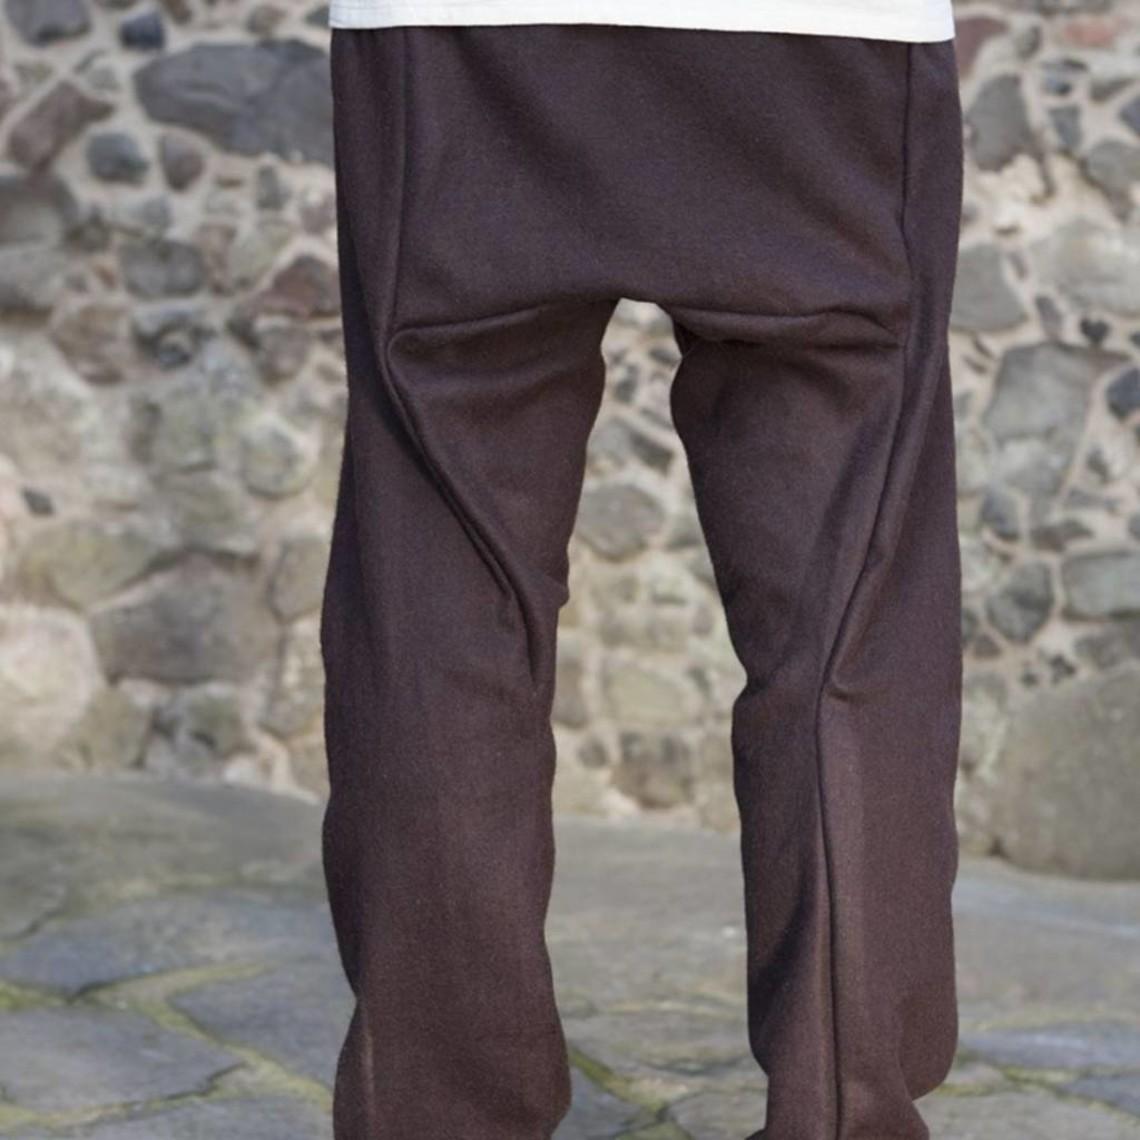 Burgschneider Tubo Thorsberg Fenris (Brown)